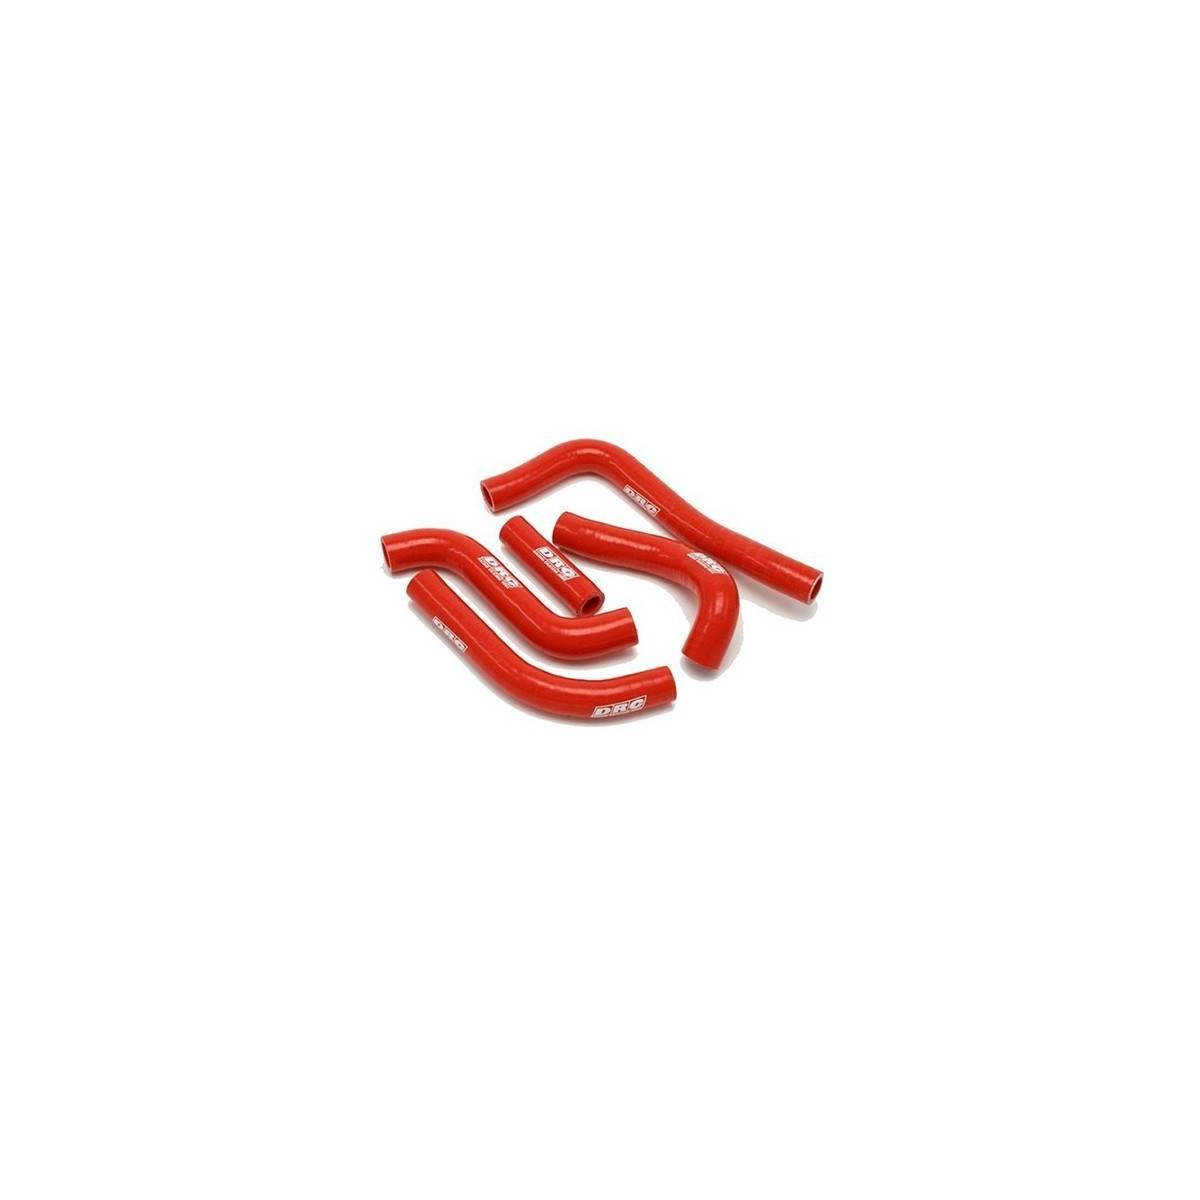 D47.01.093 - Kit Manguitos Radiador Honda Crf450R ´13 Rojo